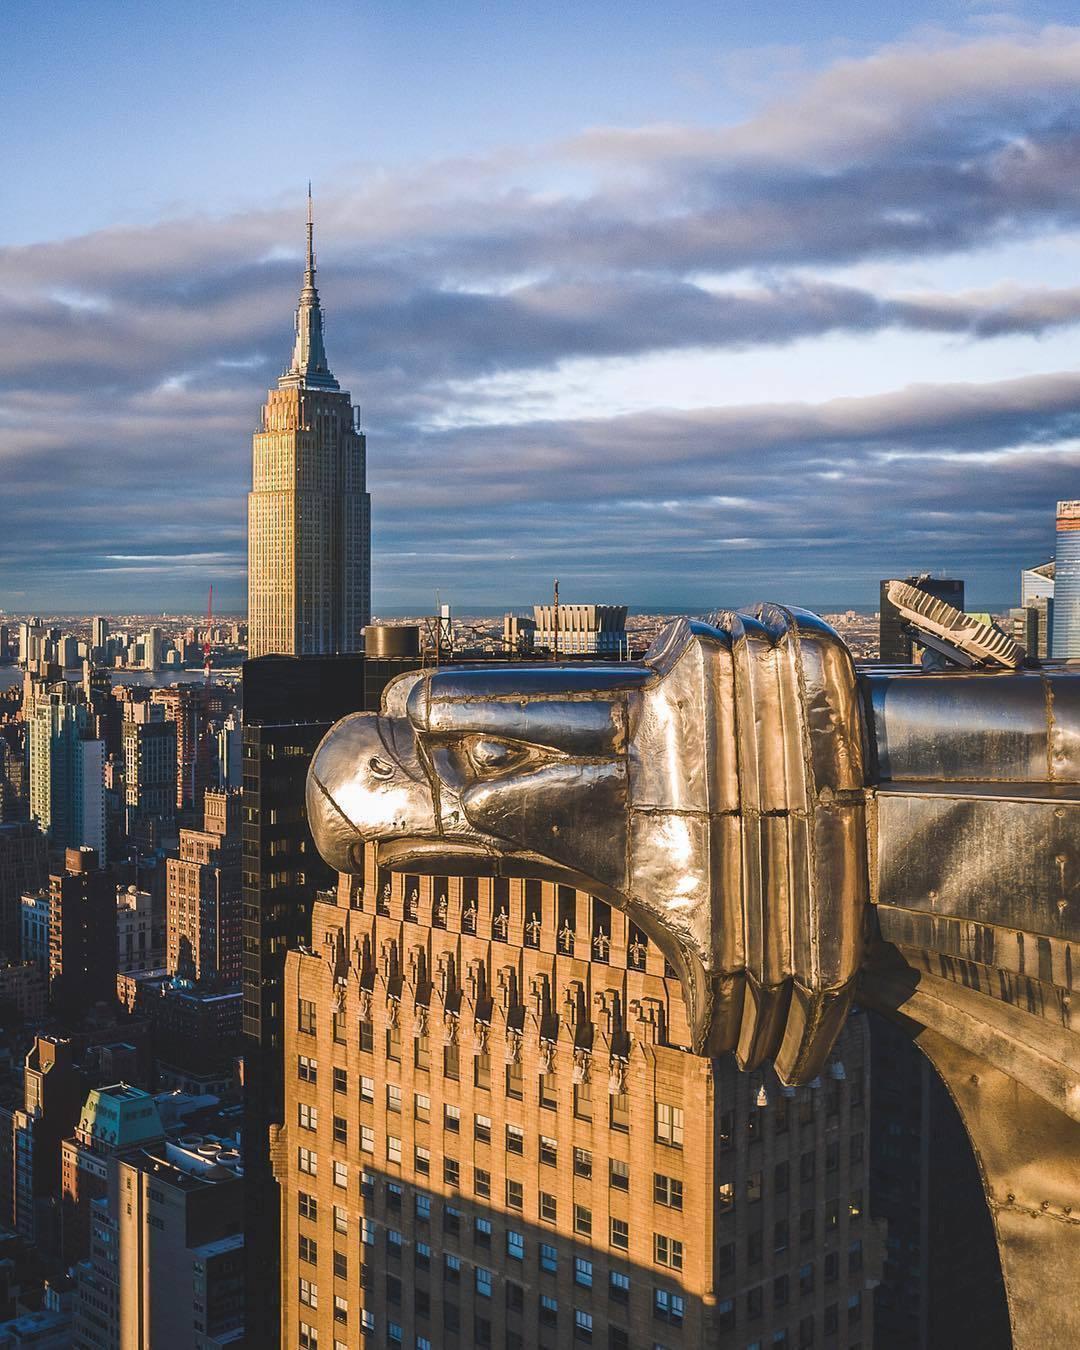 Chrysler Building Gargoyle, Manhattan. 📸 @nyc.lens